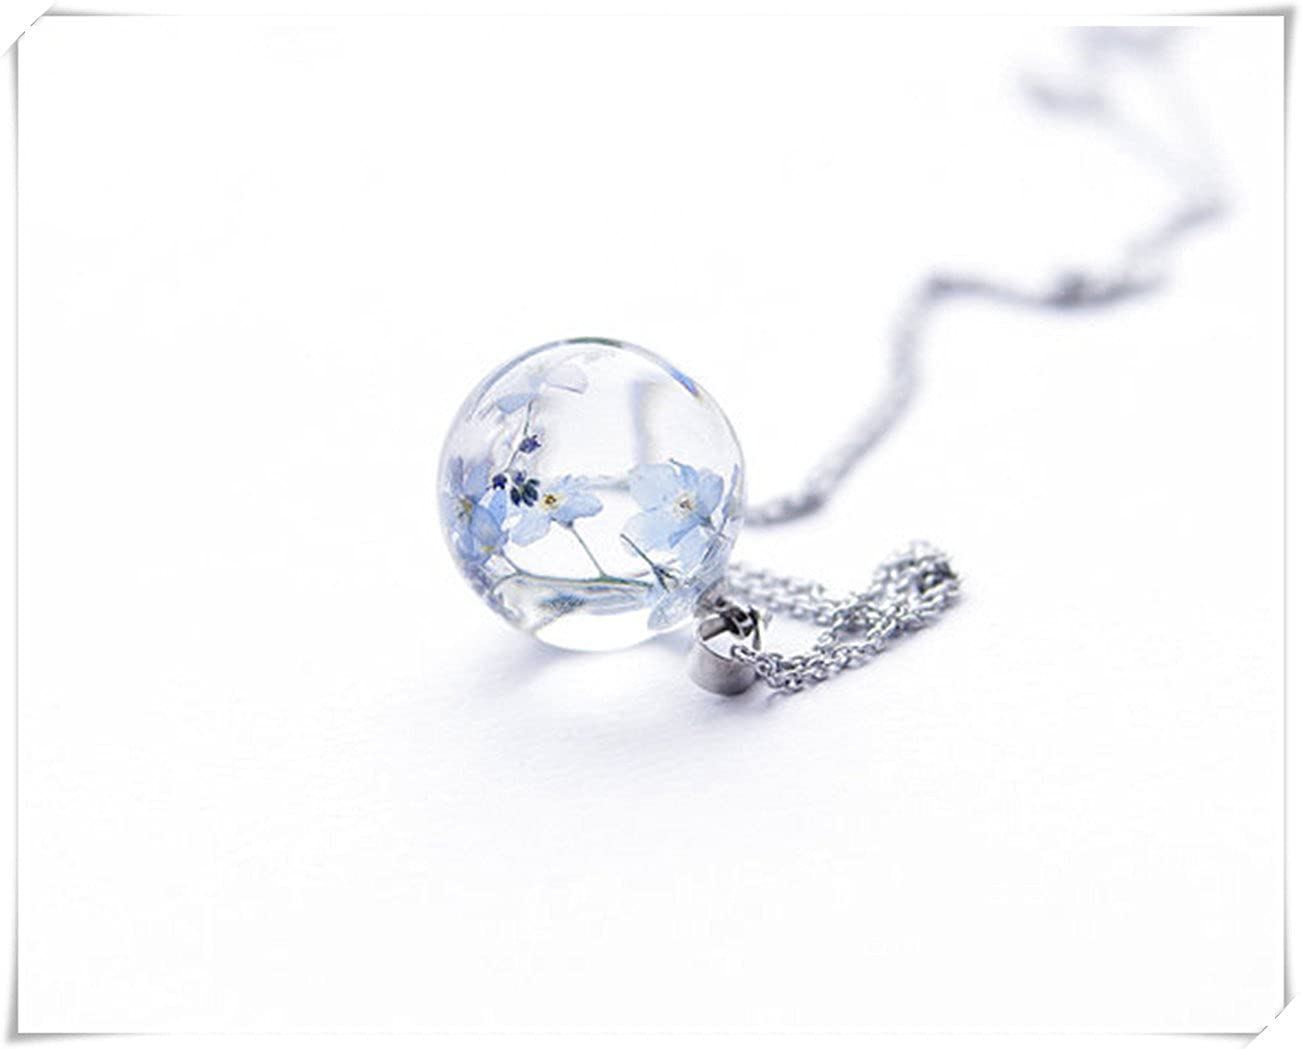 Elegant Tiny Flower Necklace Cute Silver Chain Aqua Cube Tiny Dried Flowers Simple Best Friend Gift Idea Light Dark Blue